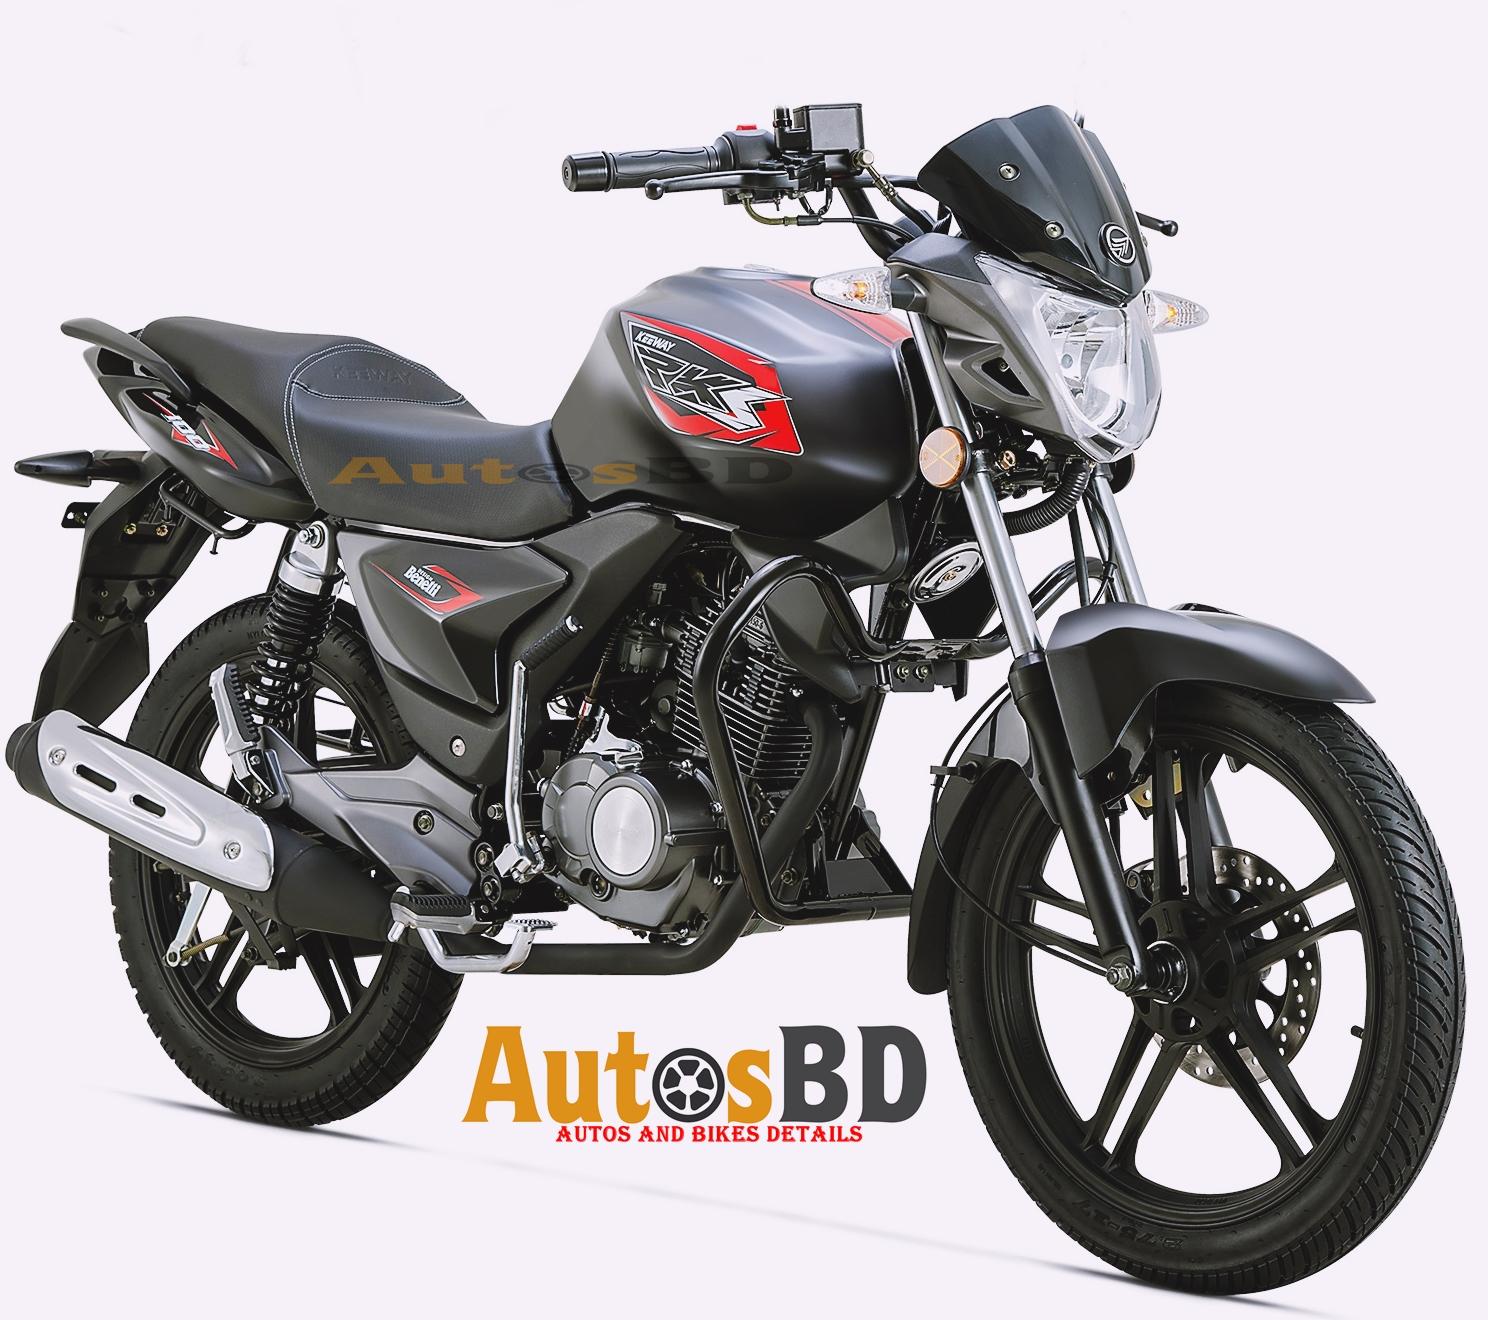 Keeway RKS 100 v3 Motorcycle Specification